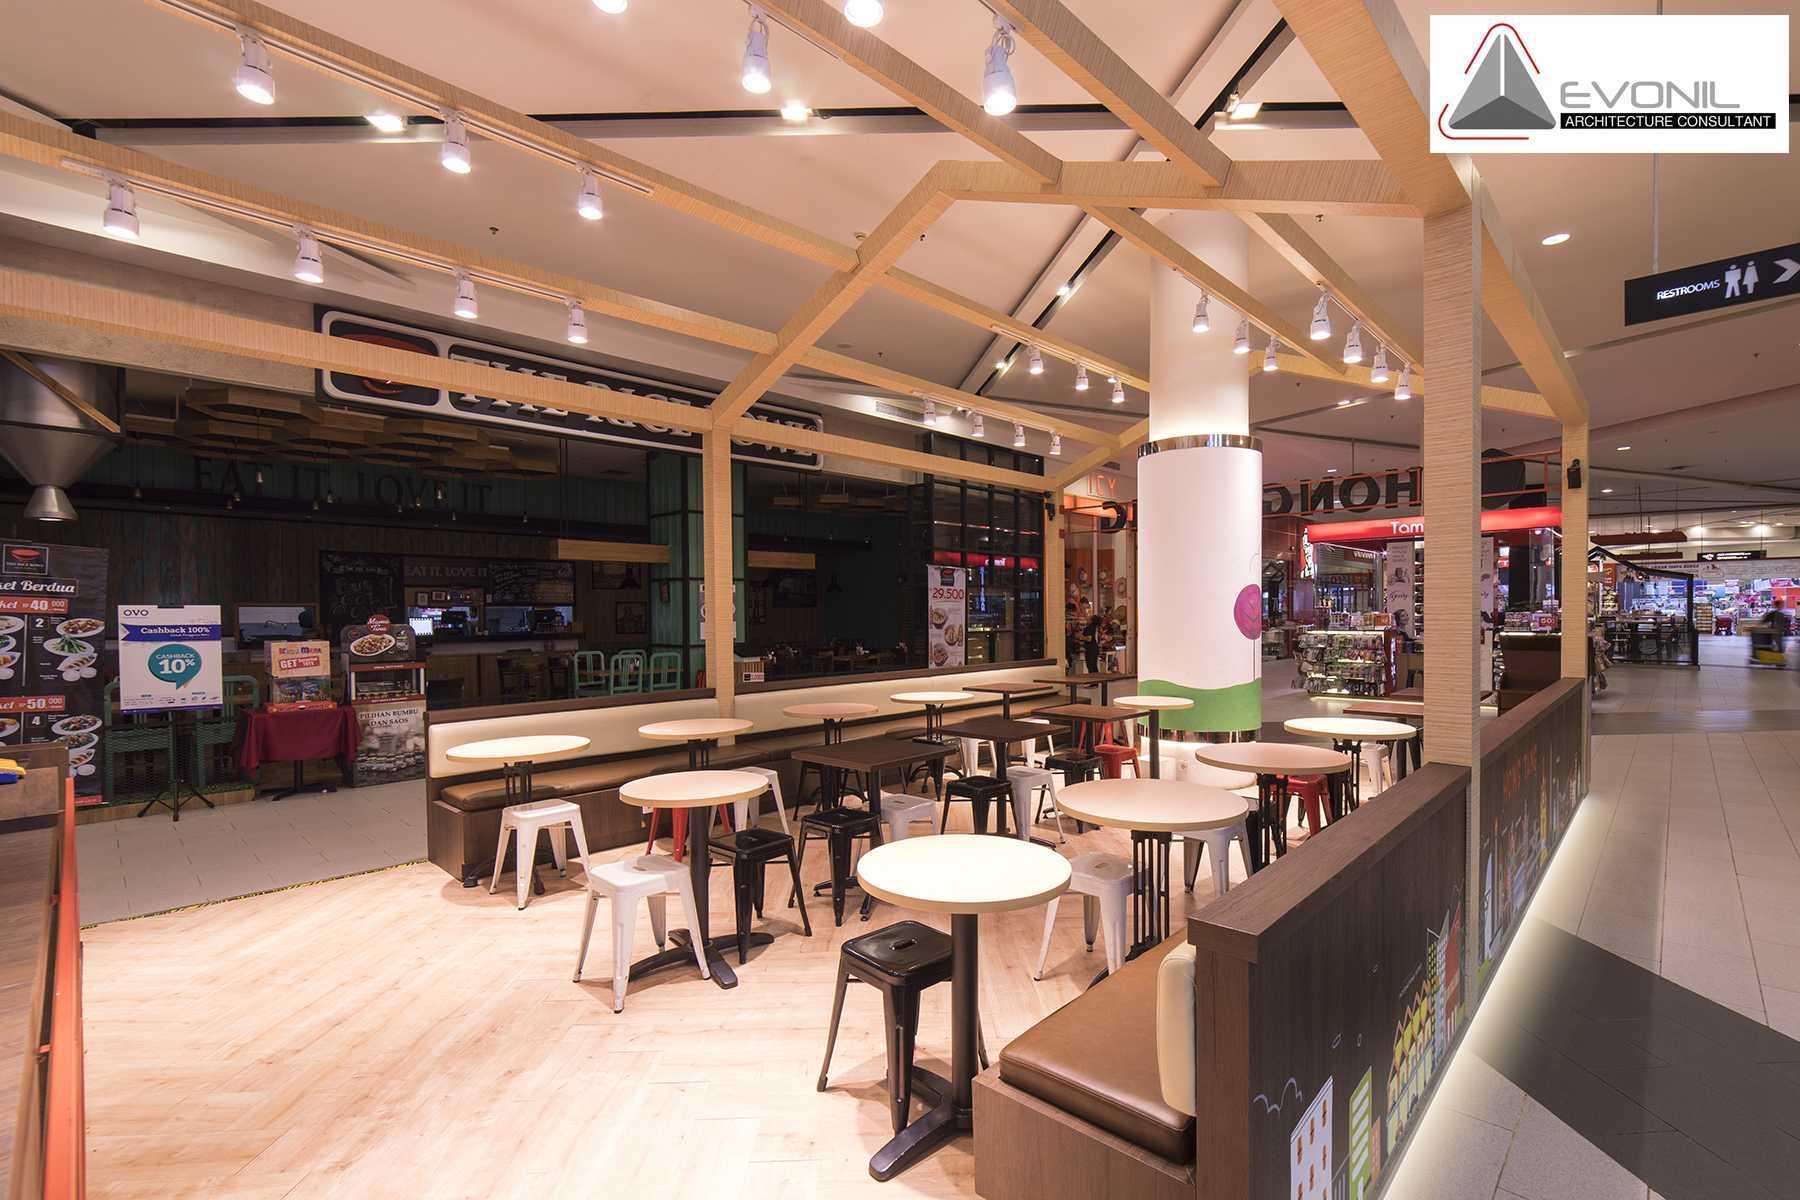 Evonil Architecture Hong Tang Dessert Cafe - Gandaria City Mall Jakarta, Daerah Khusus Ibukota Jakarta, Indonesia Jakarta, Daerah Khusus Ibukota Jakarta, Indonesia Hong Tang Gandaria City Mall Evonil Architecture Scandinavian 61376